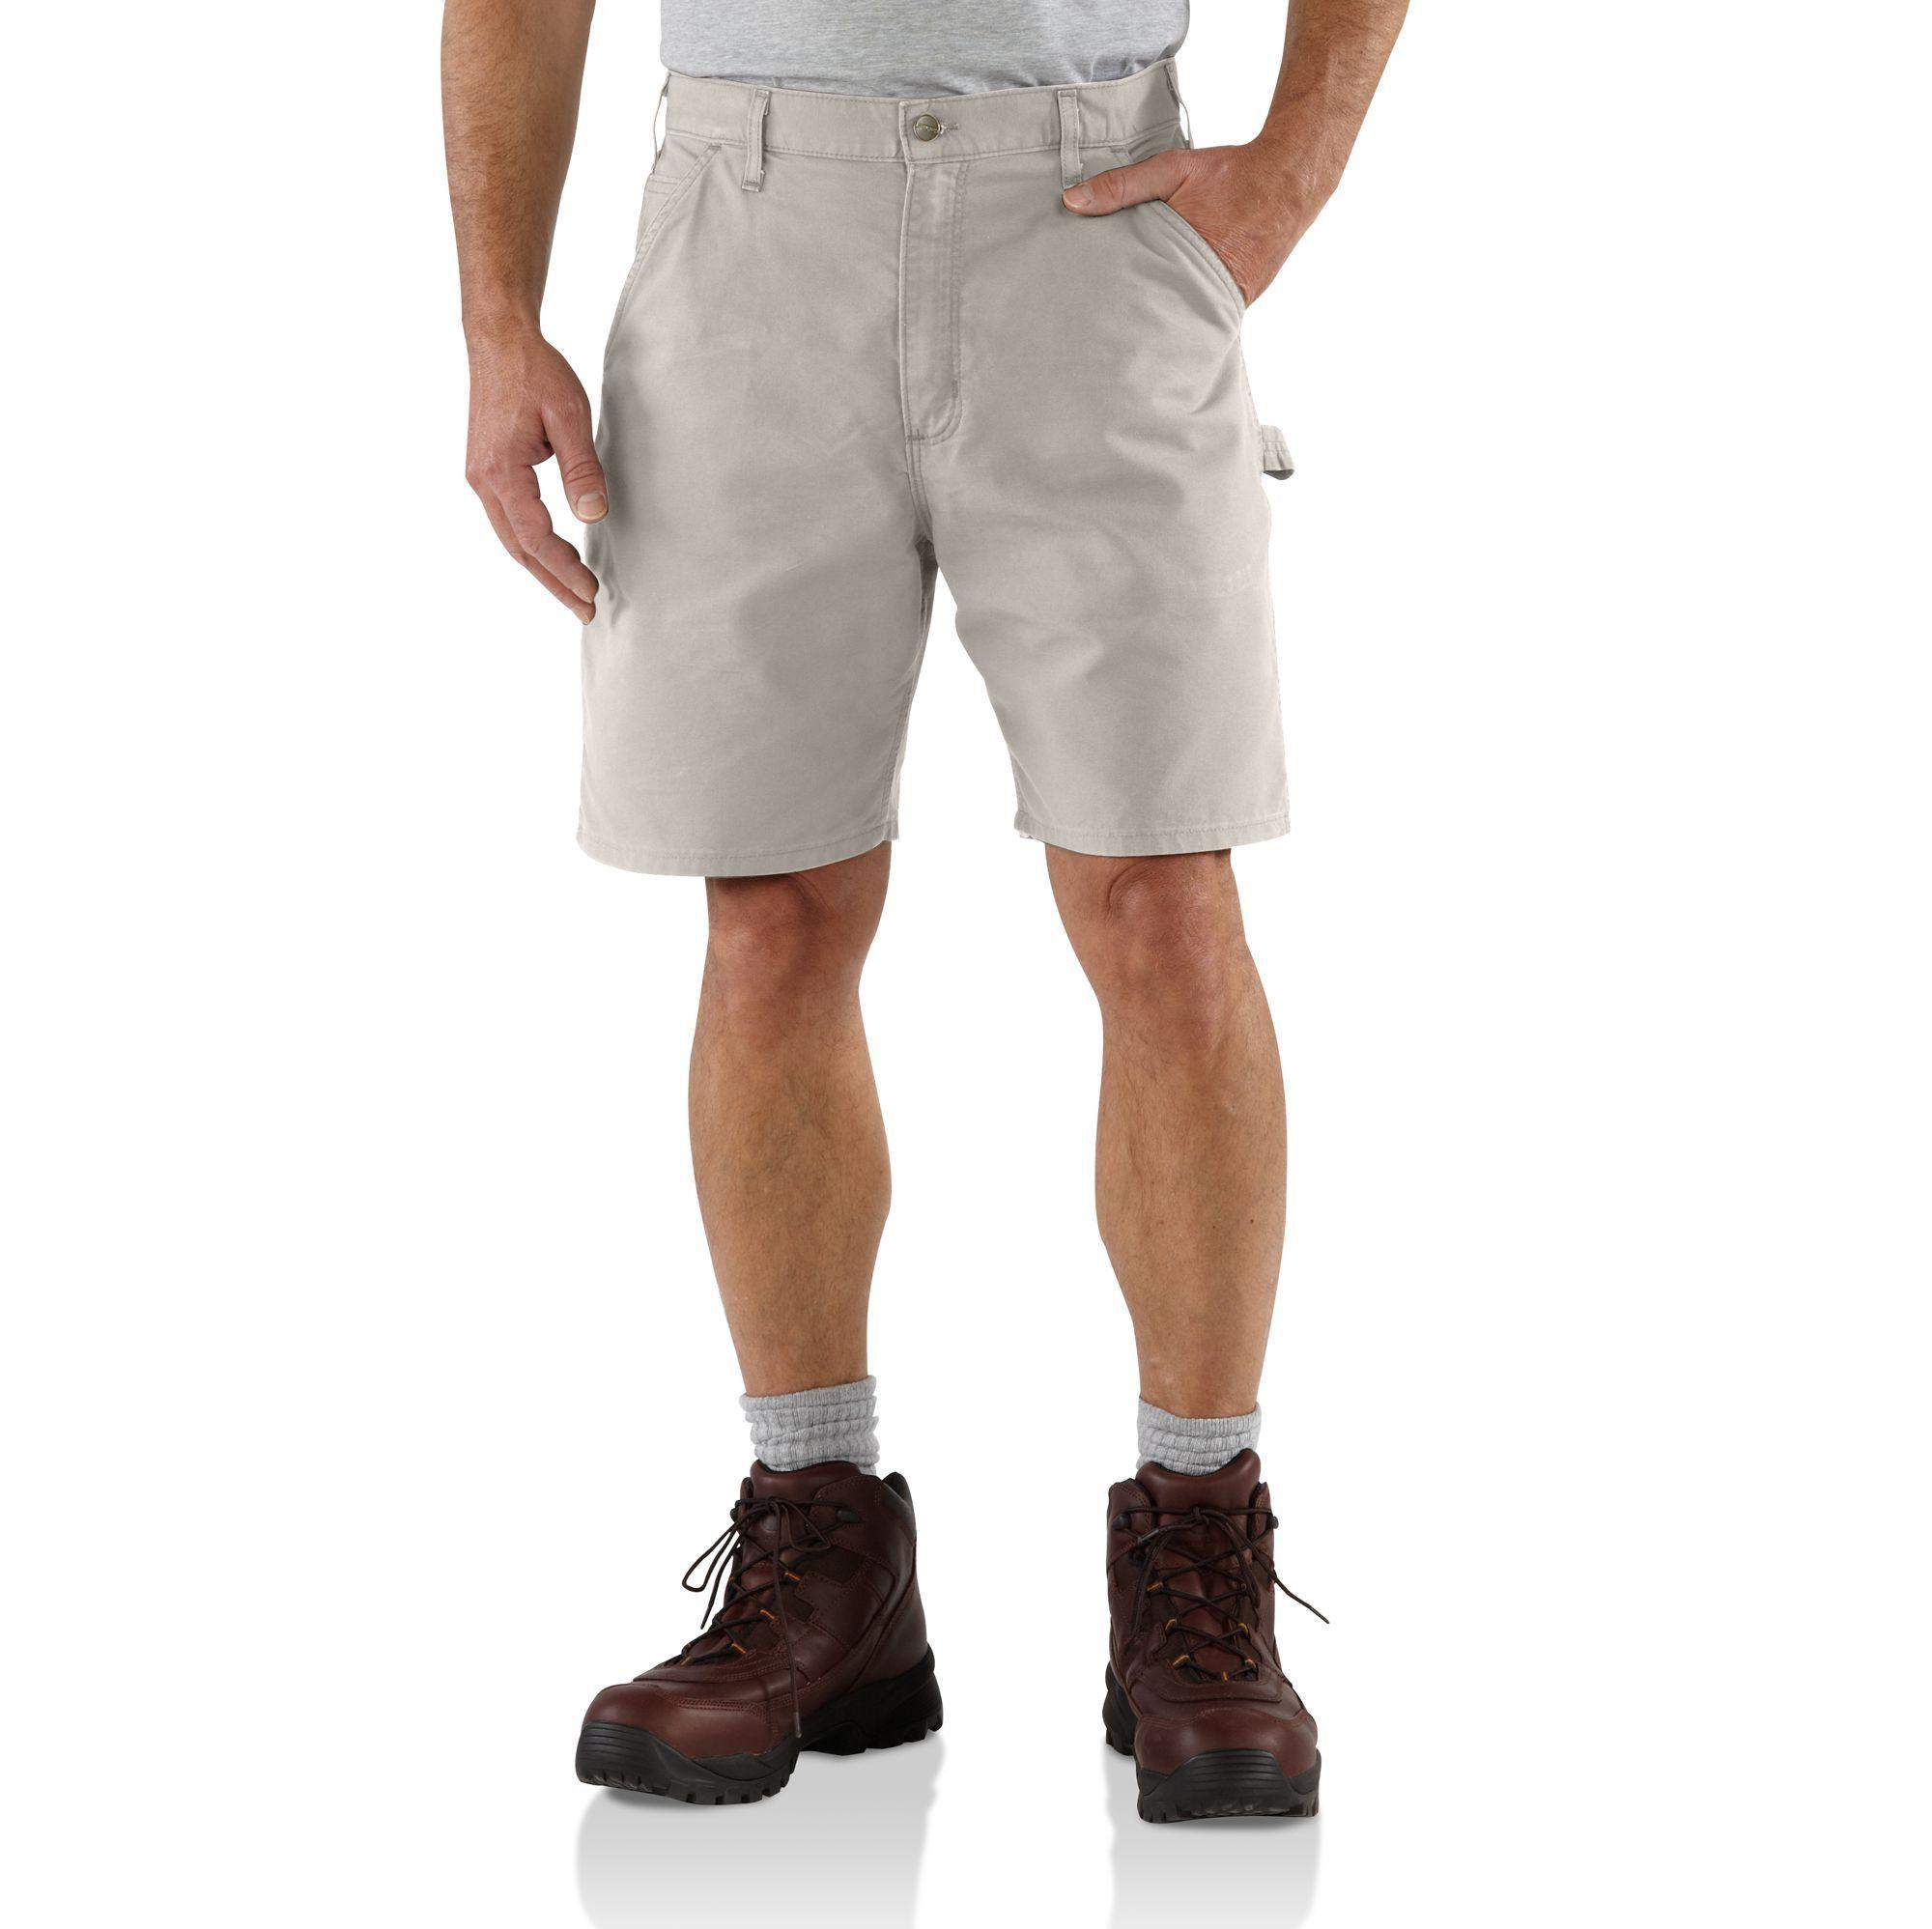 Carhartt Mens 11 Cotton Ripstop Cargo Work Short